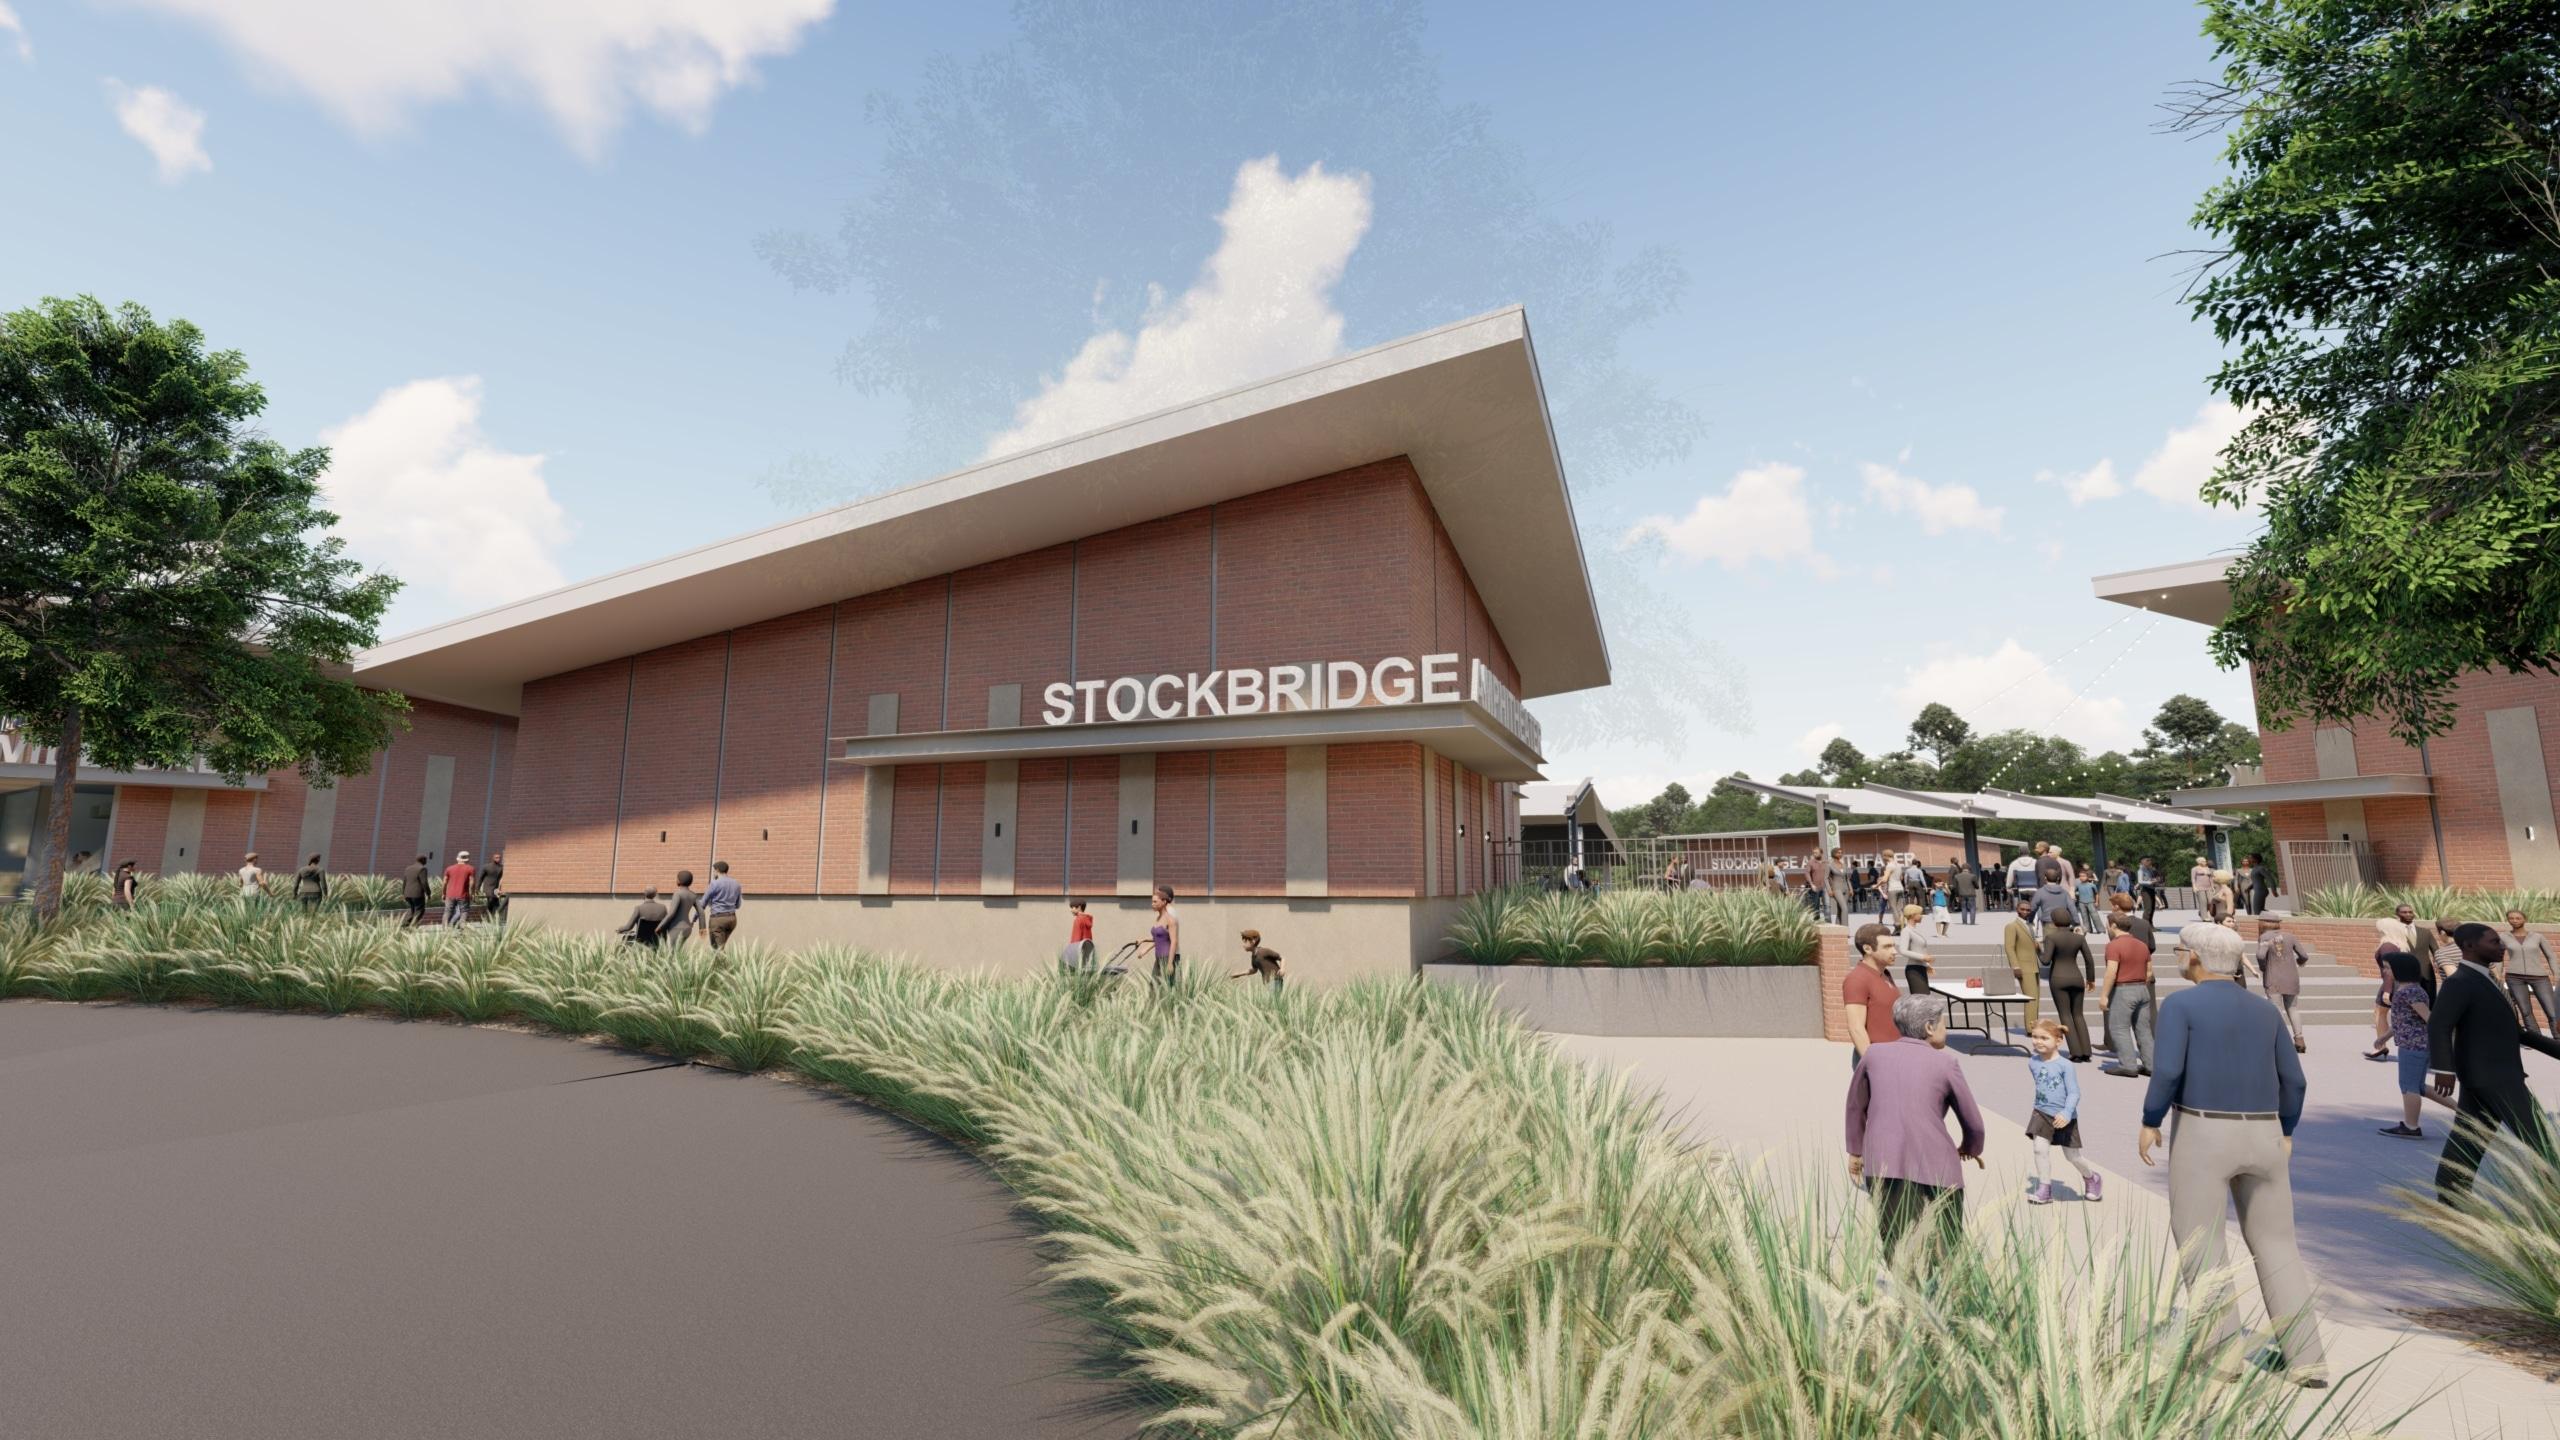 Stockbridge Amphitheater and Park